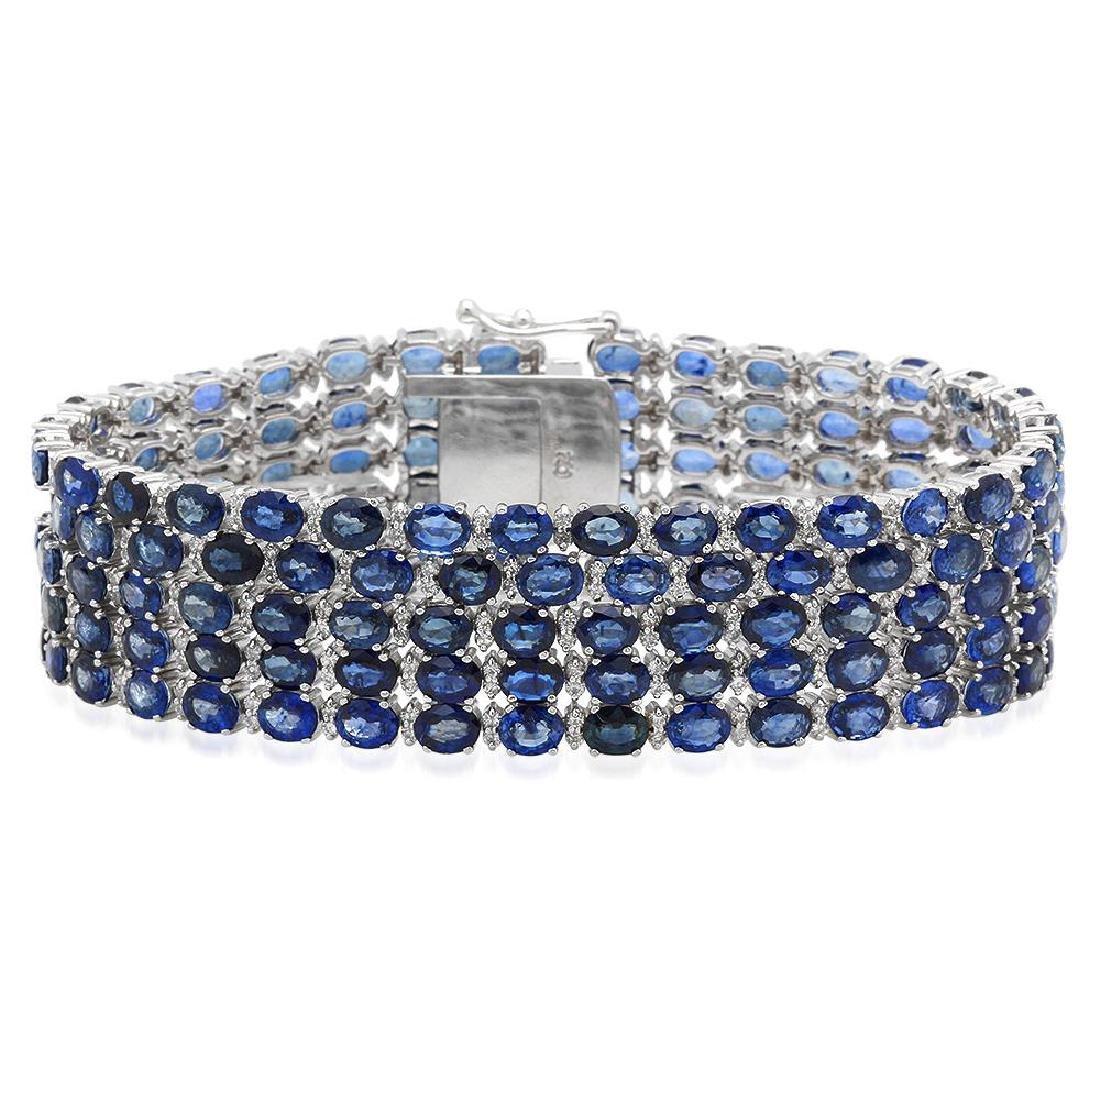 18K Gold 48.44ct Sapphire 4.02ct Diamond Bracelet